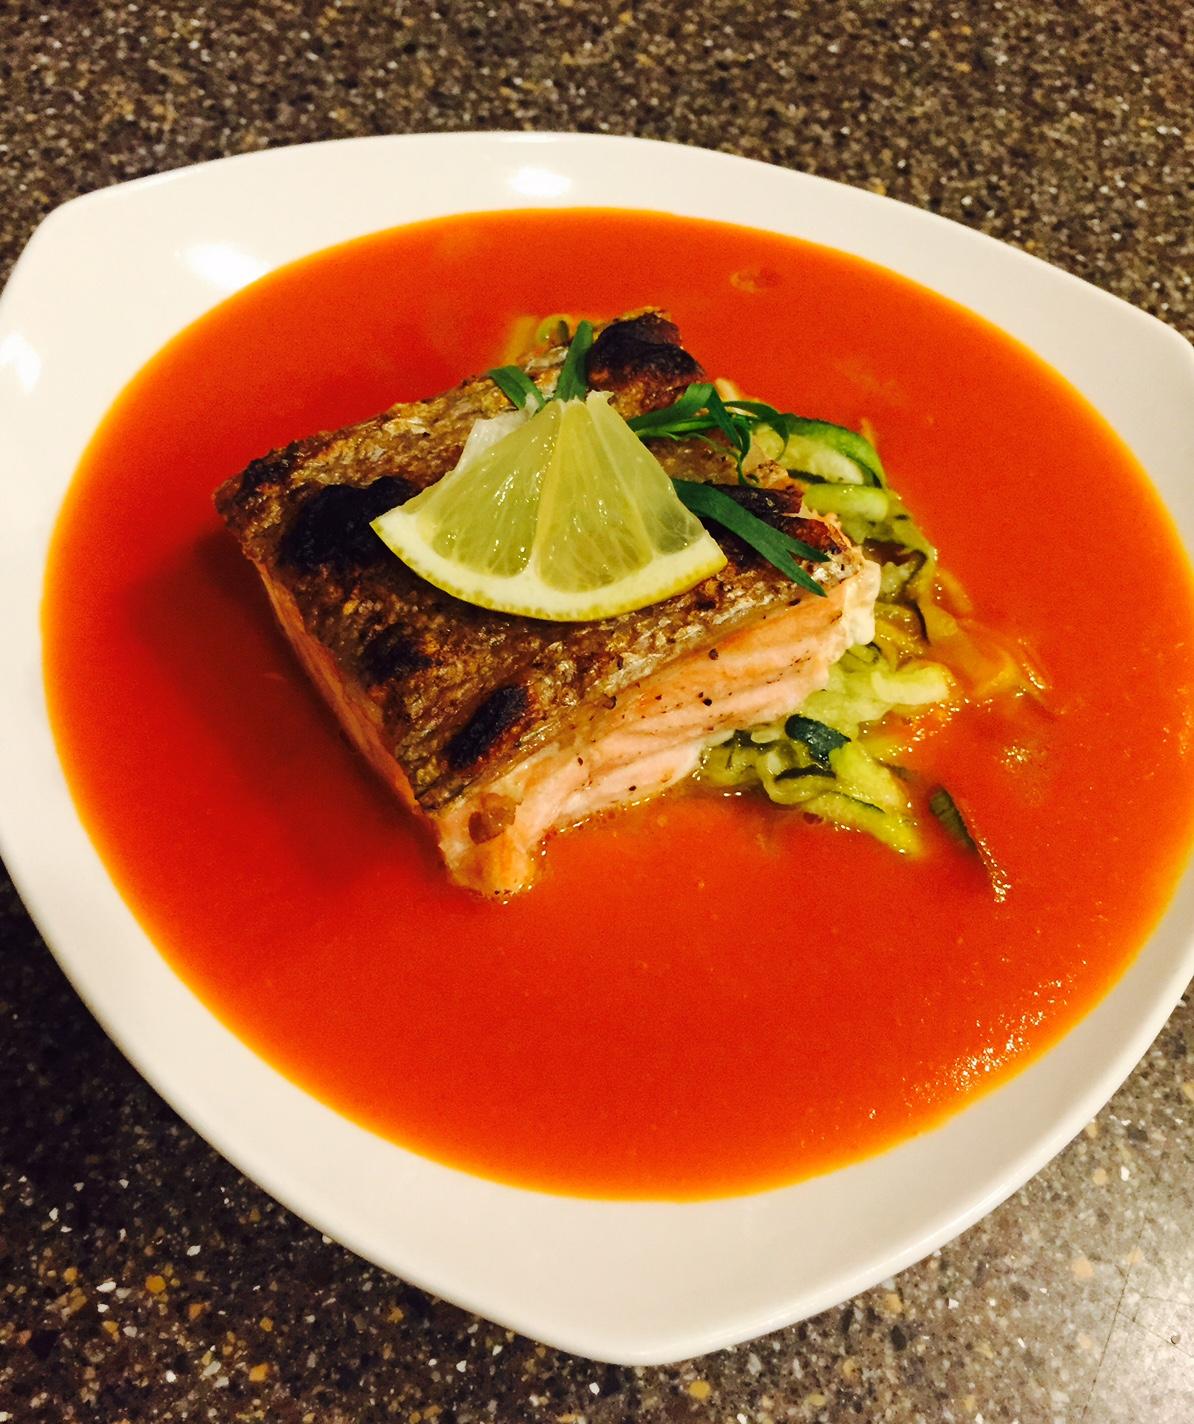 Crispy Skin Wild Caught Salmon over Zucchini Noodles & Lemon, Tarragon Tomato Soup